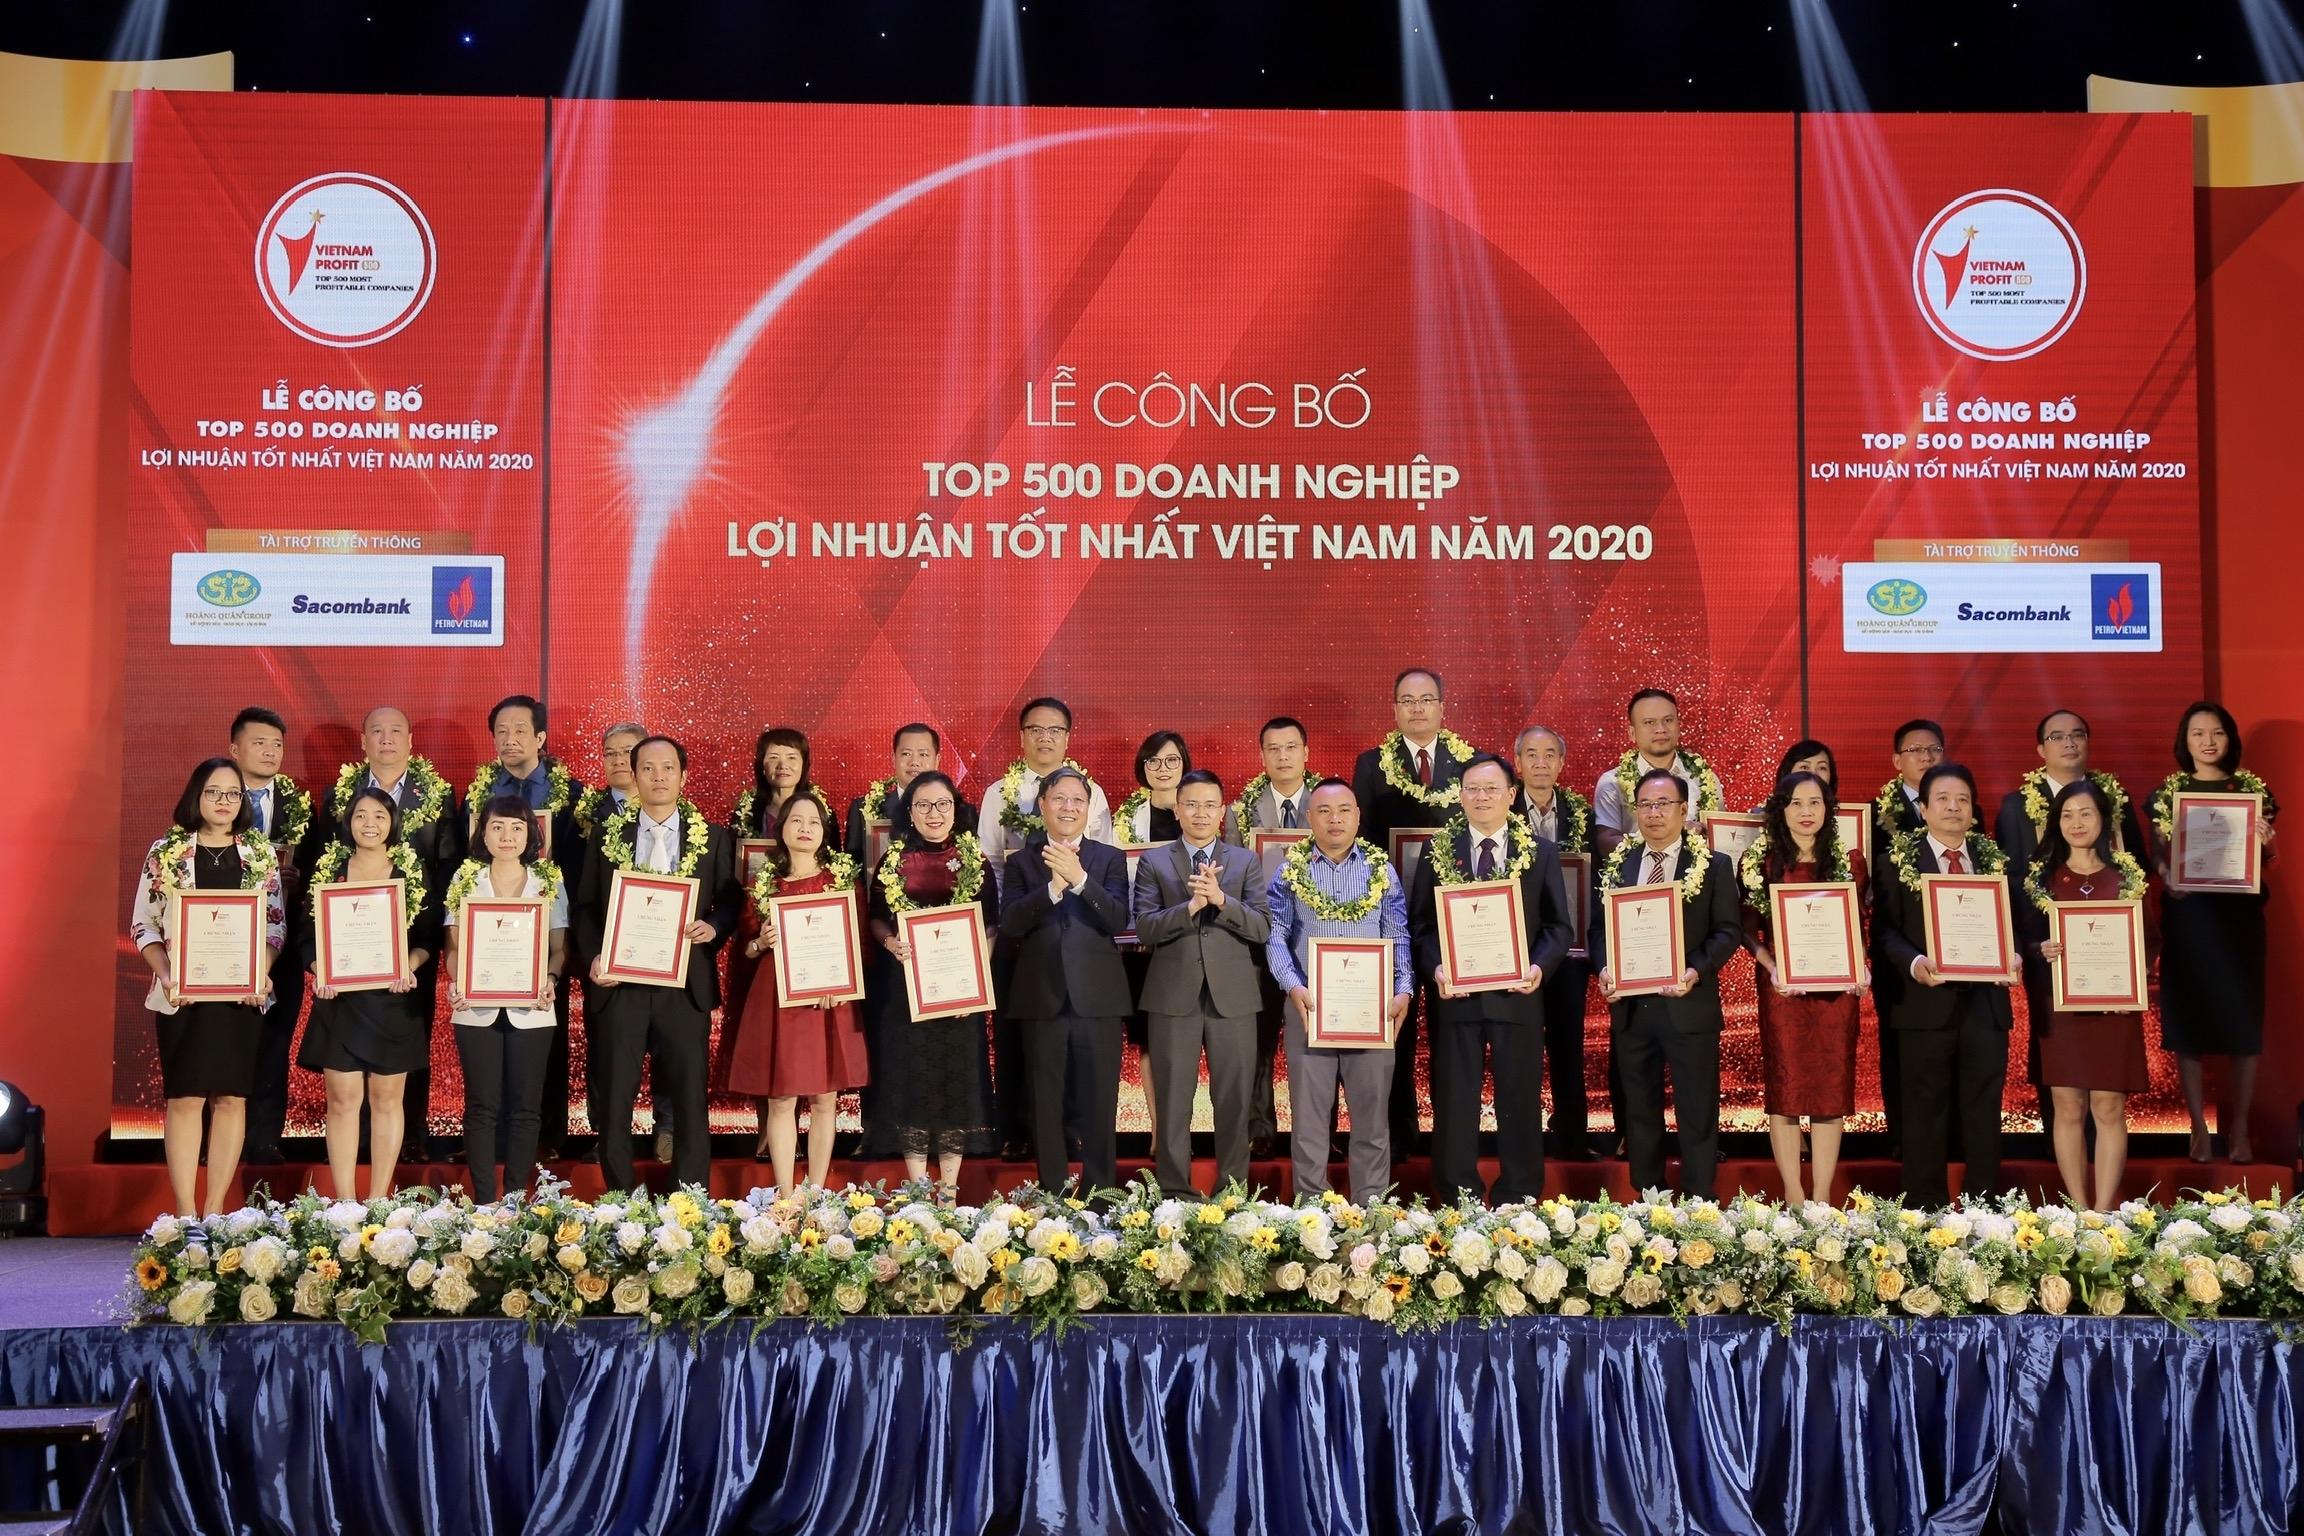 1514-vinh-danh-top-500-doanh-nghiyp-co-lyi-nhuyn-tyt-nhyt-viyt-nam-nym-2020